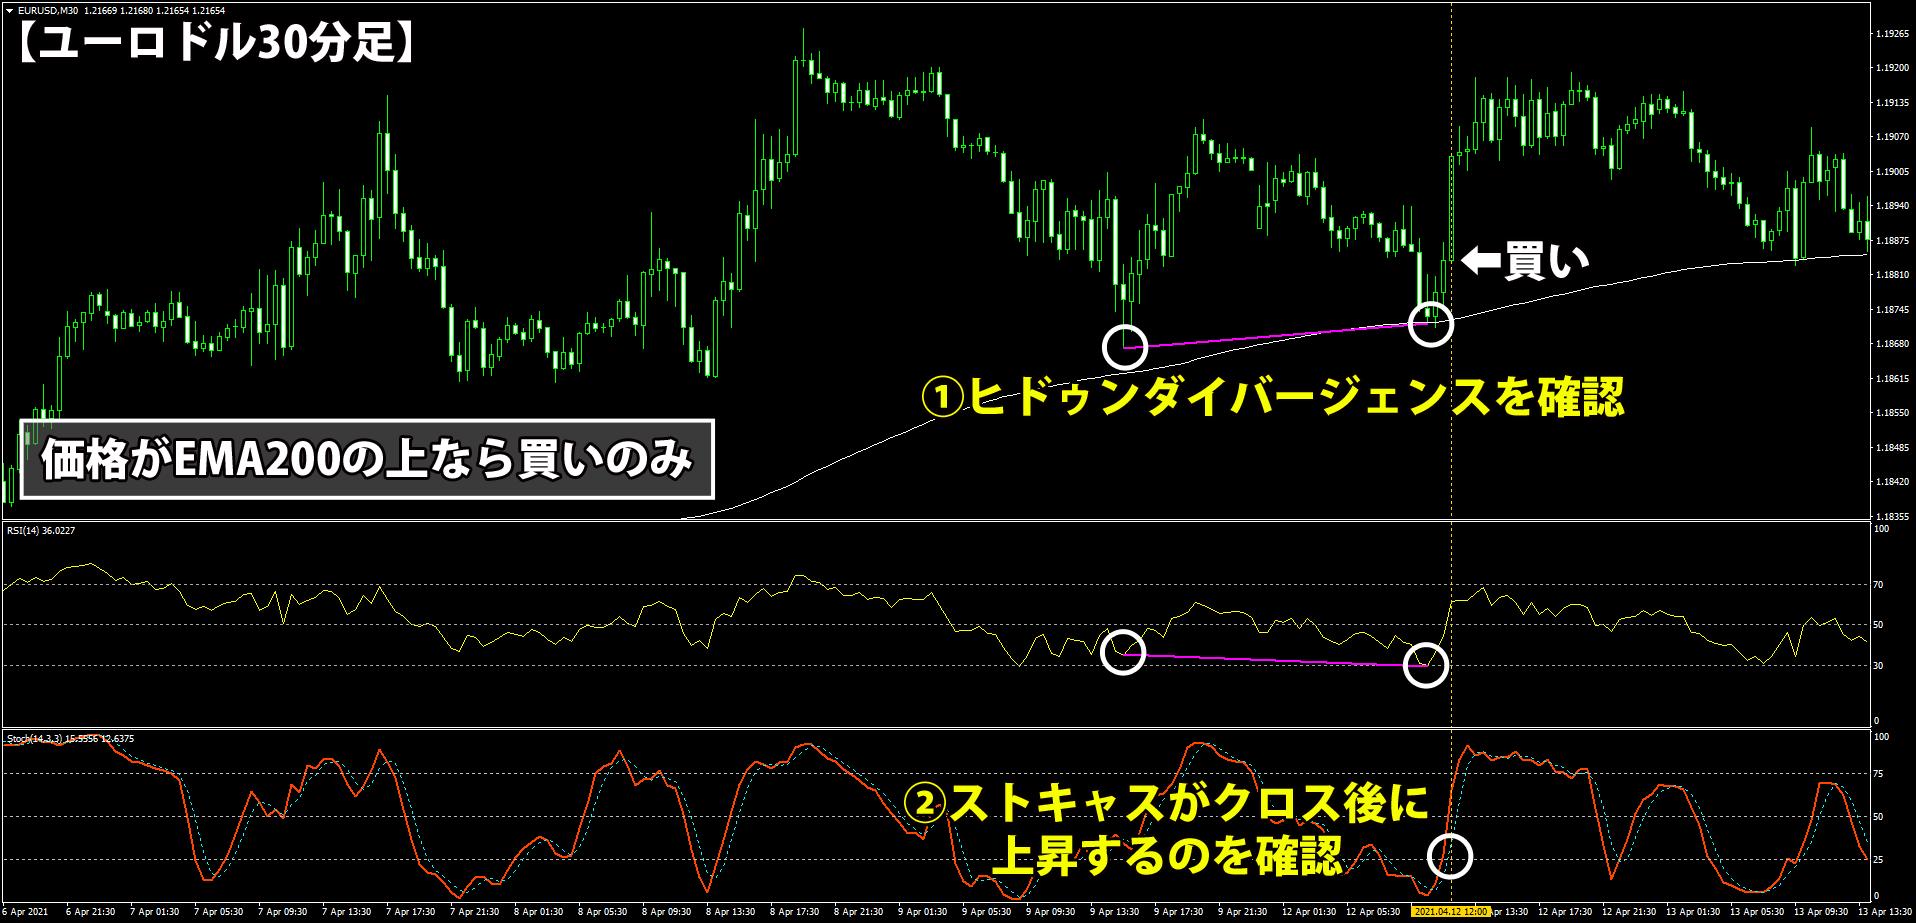 EMA・RSI・ストキャスを使う30分足トレード手法のエントリールール(買い)